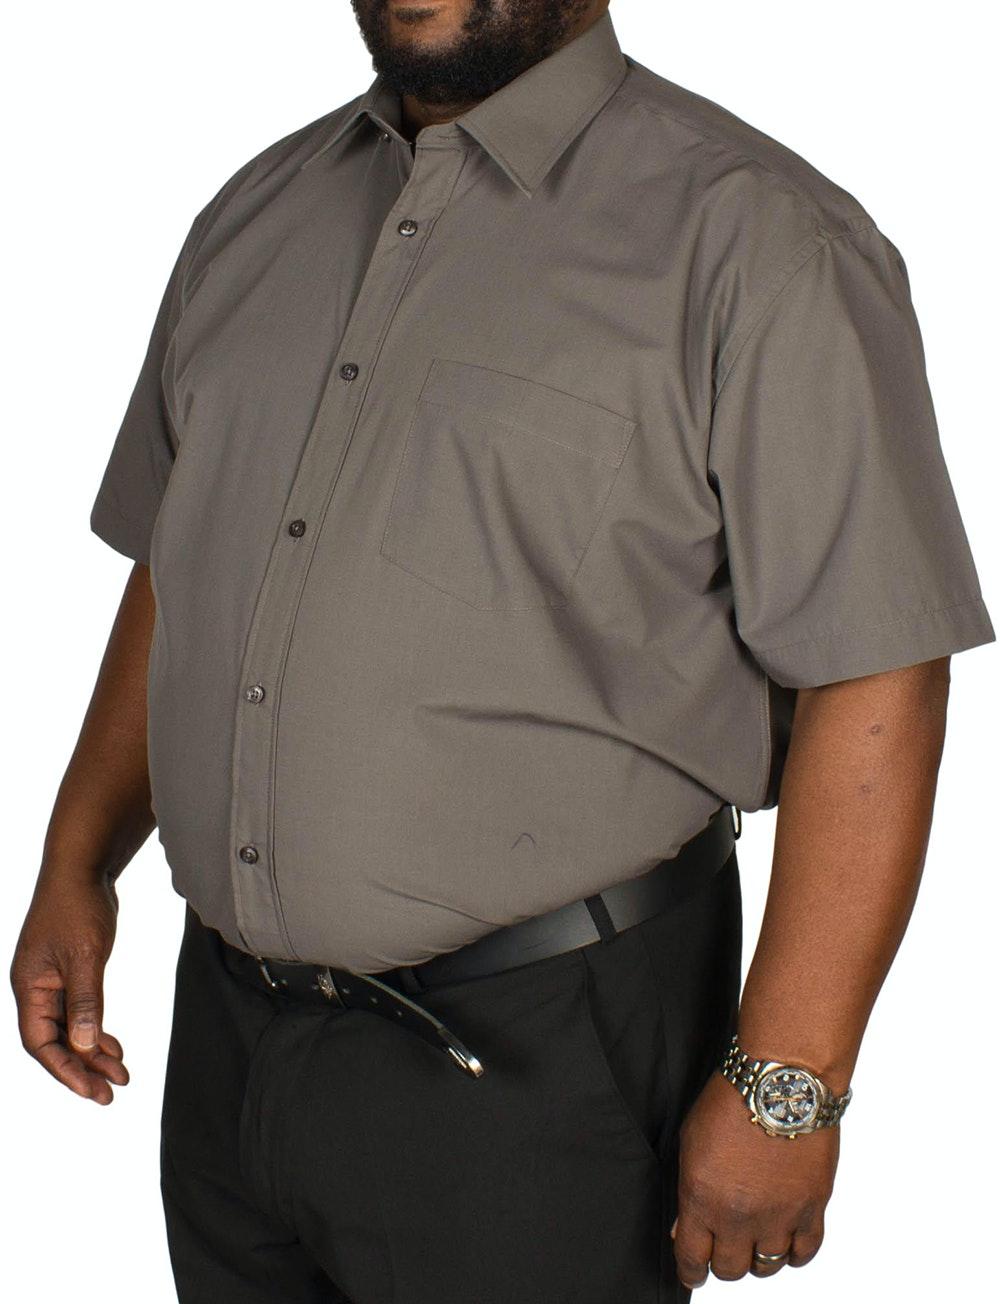 Metaphor Plain Charcoal Short Sleeve Shirt